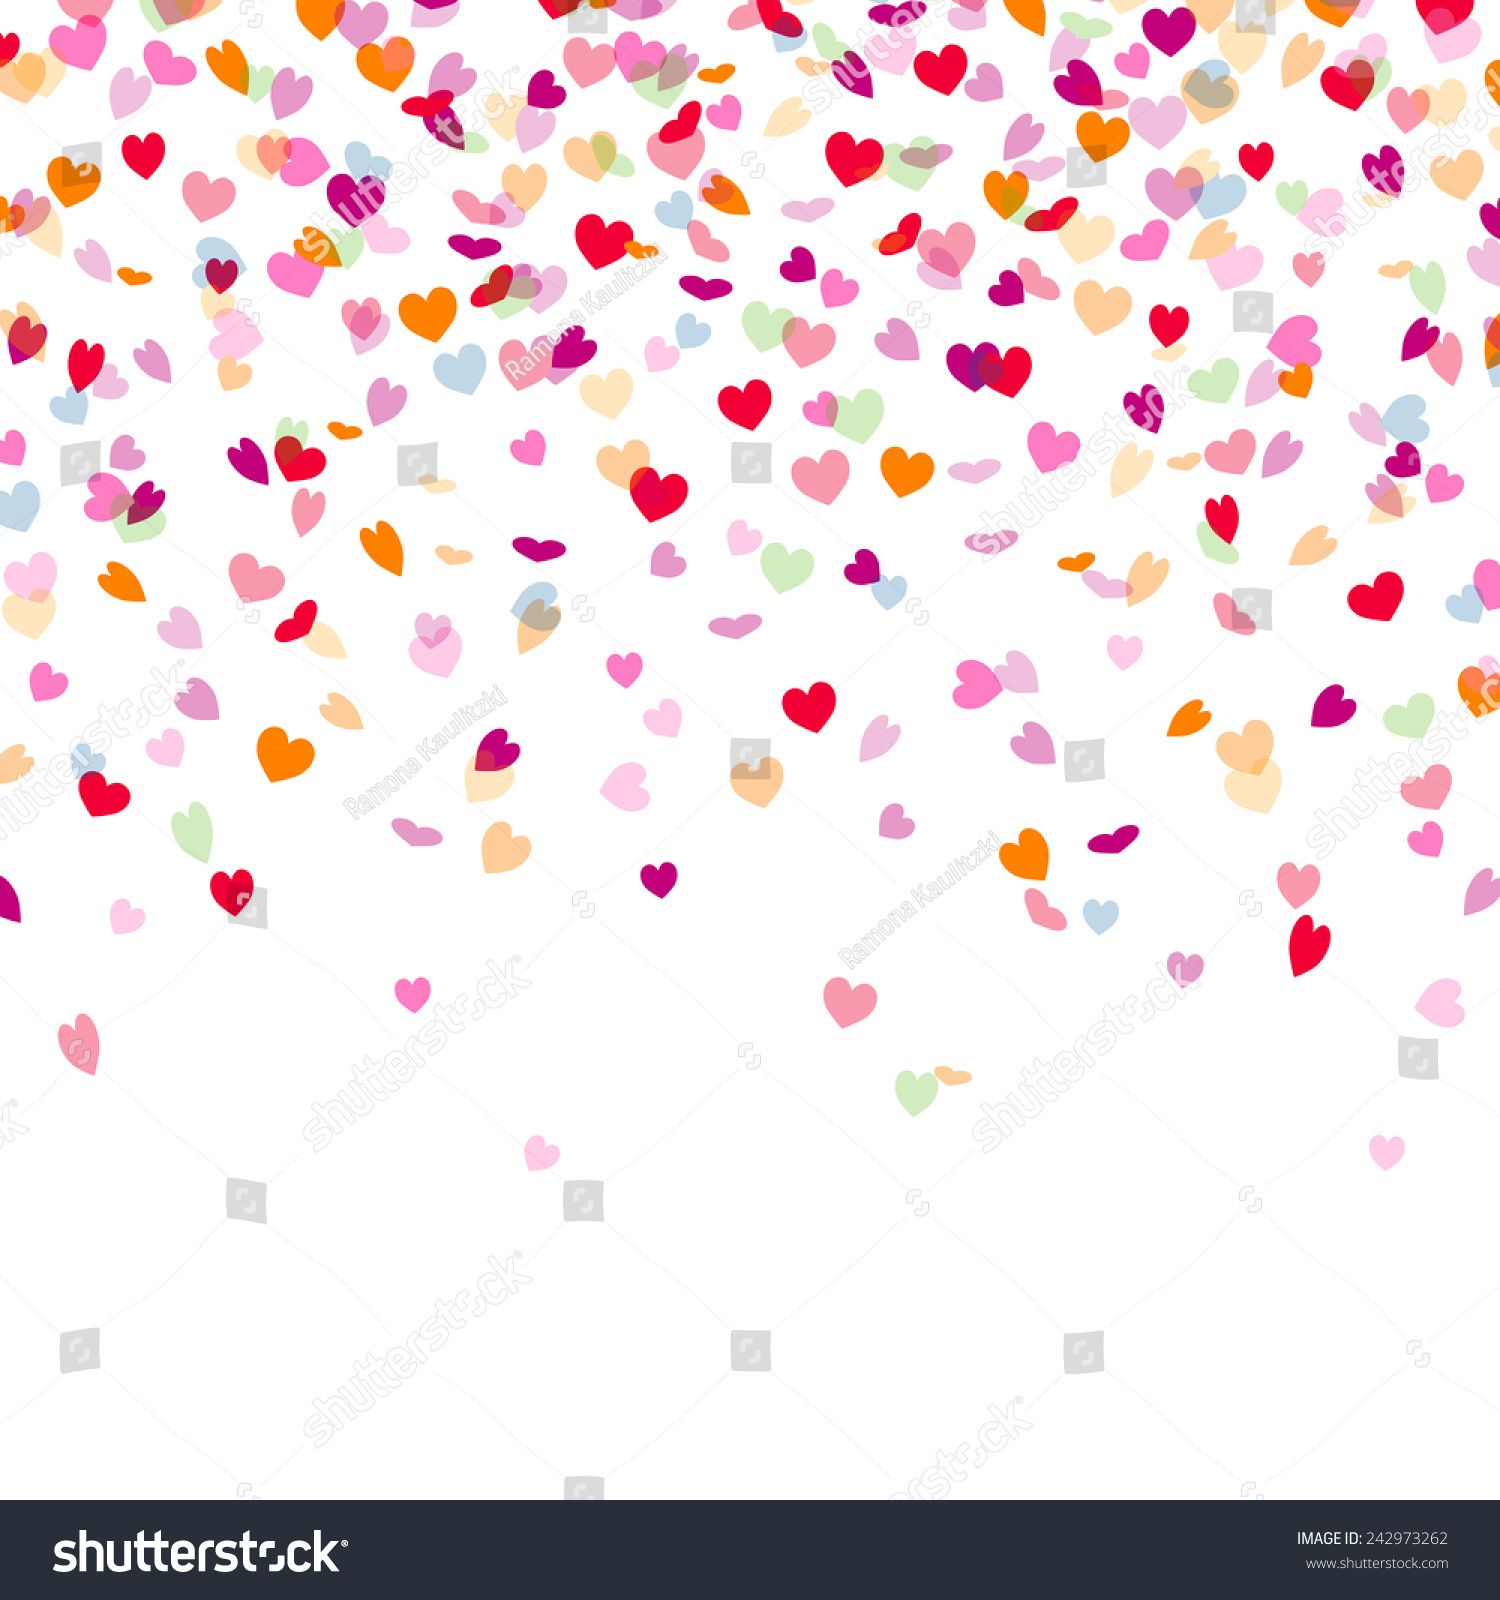 Purple Falling Circles Wallpaper Vector Illustration Colorful Background Heart Confetti